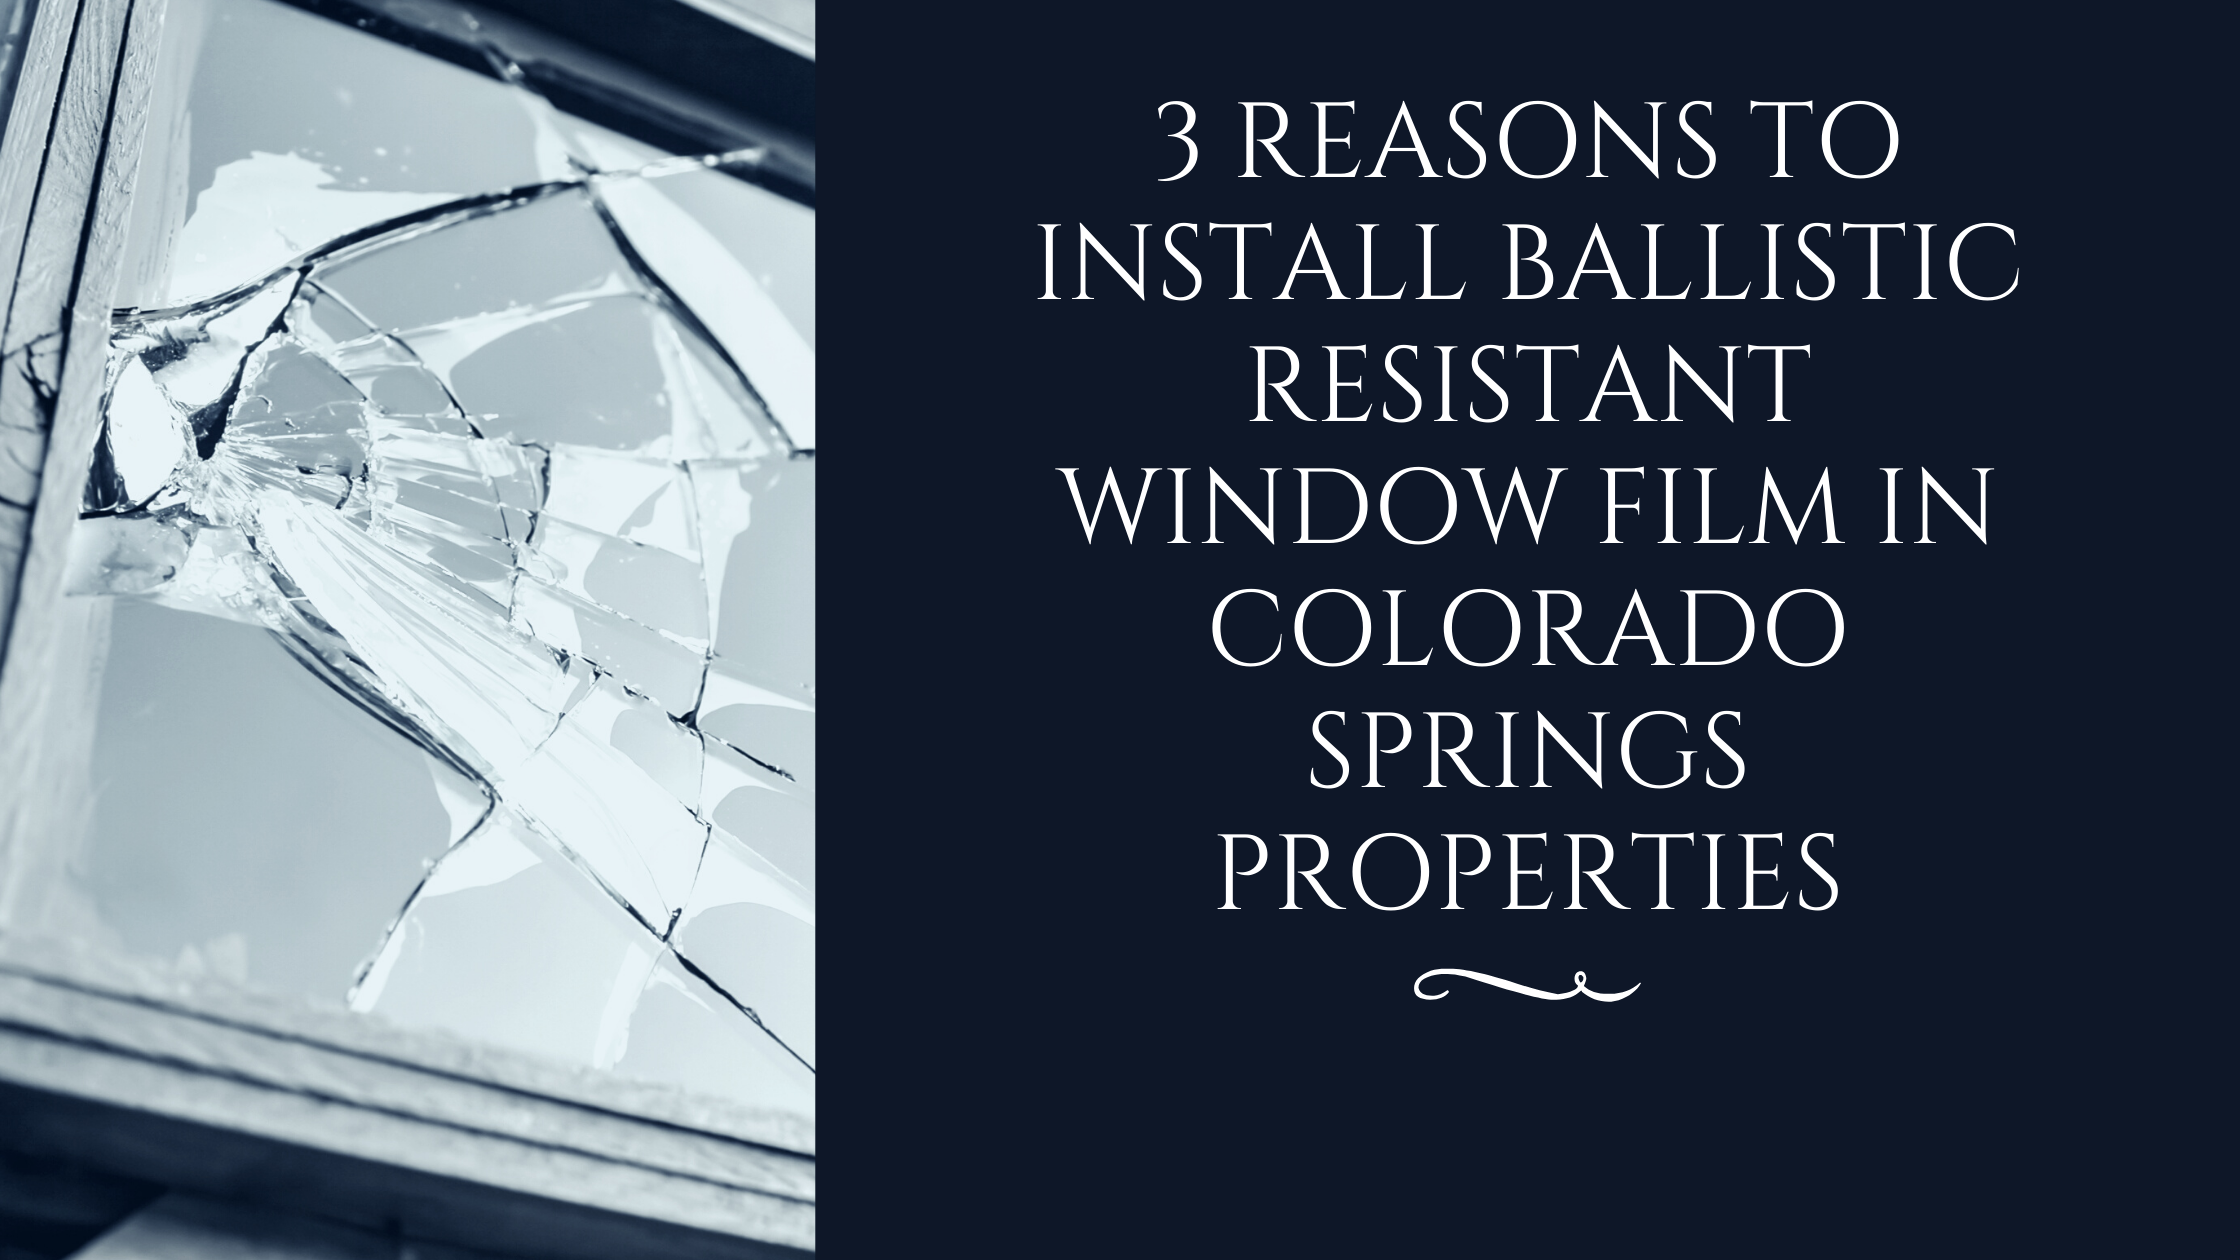 3 Reasons to Install Ballistic Resistant Window Film In Colorado Springs Properties